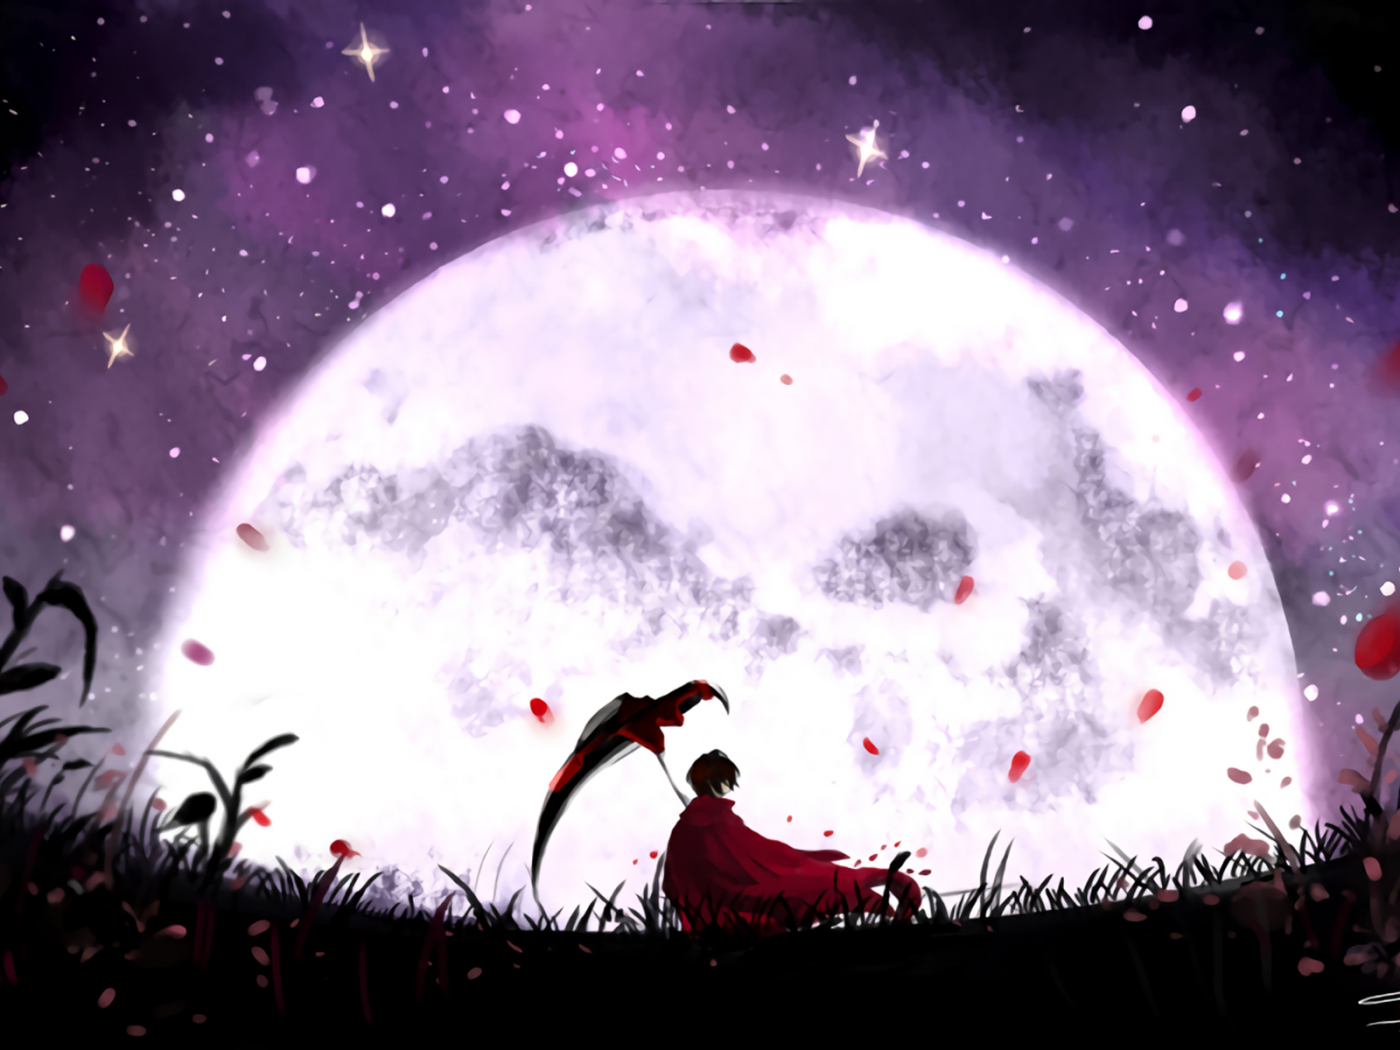 Desktop Wallpaper Moon Night Ruby Rose Rwby Art Hd Image Picture Background Ca0270